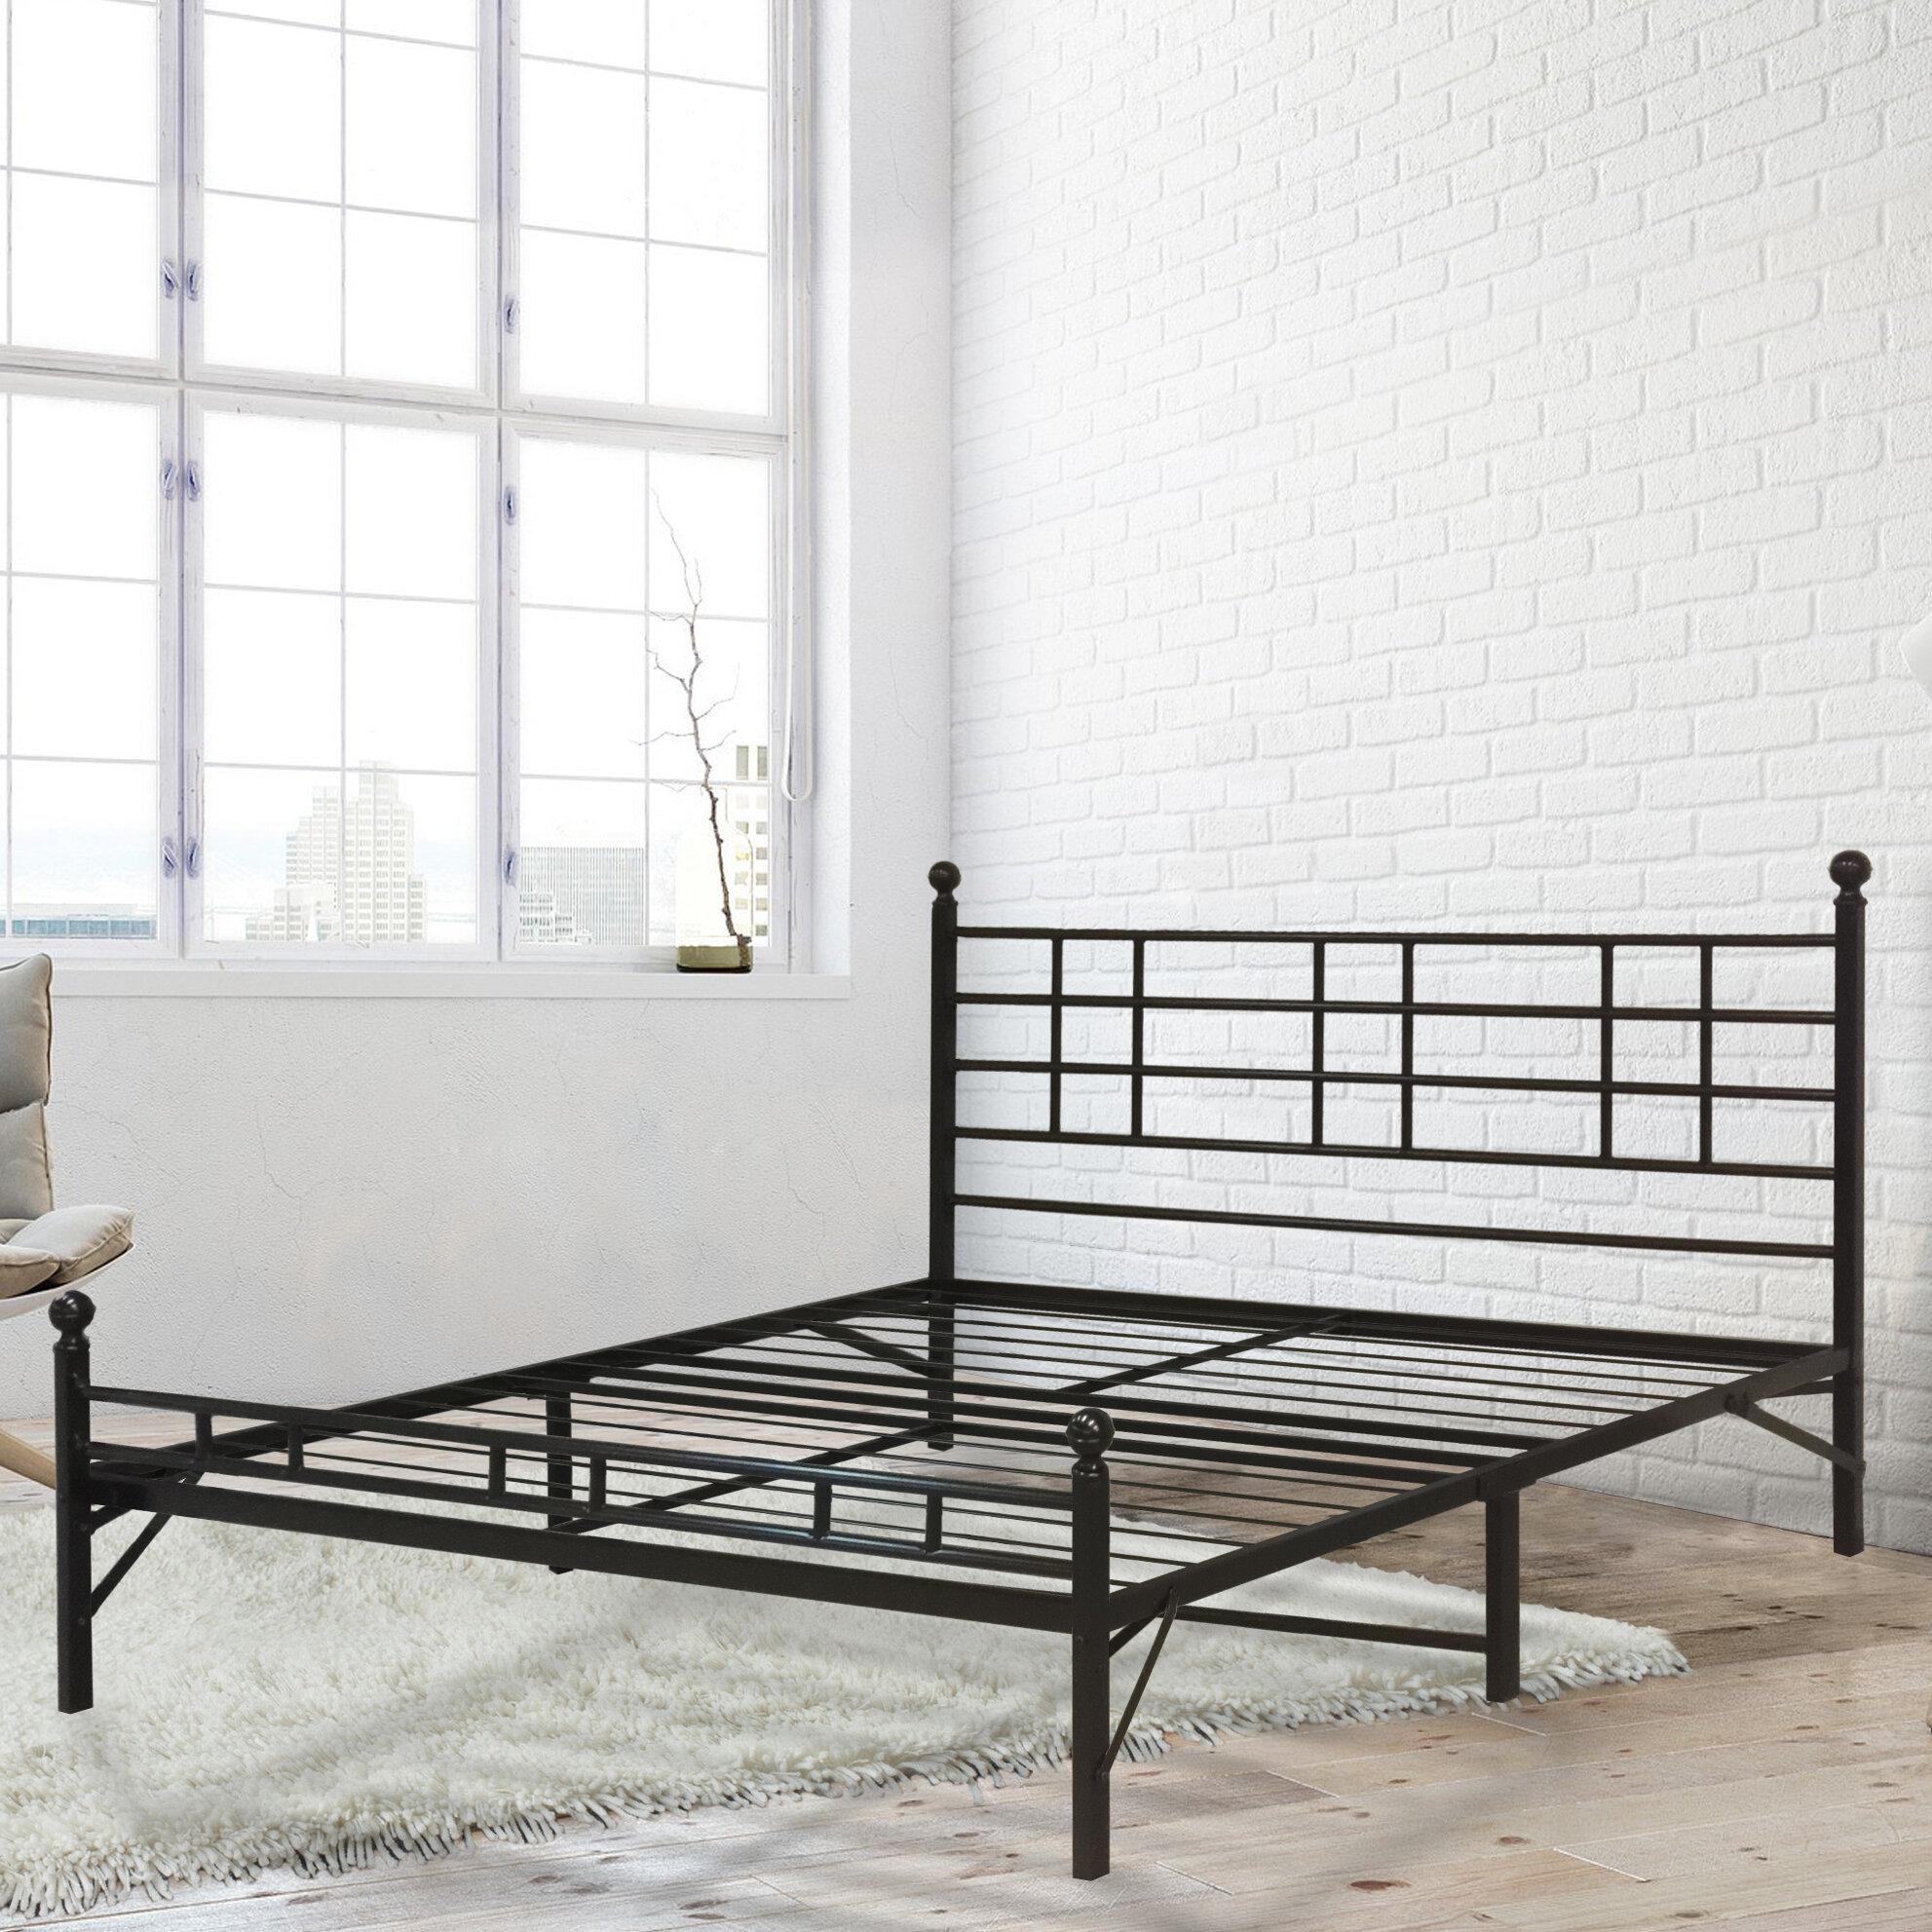 Best Price Quality Model H Platform Bed Frame & Reviews | Wayfair